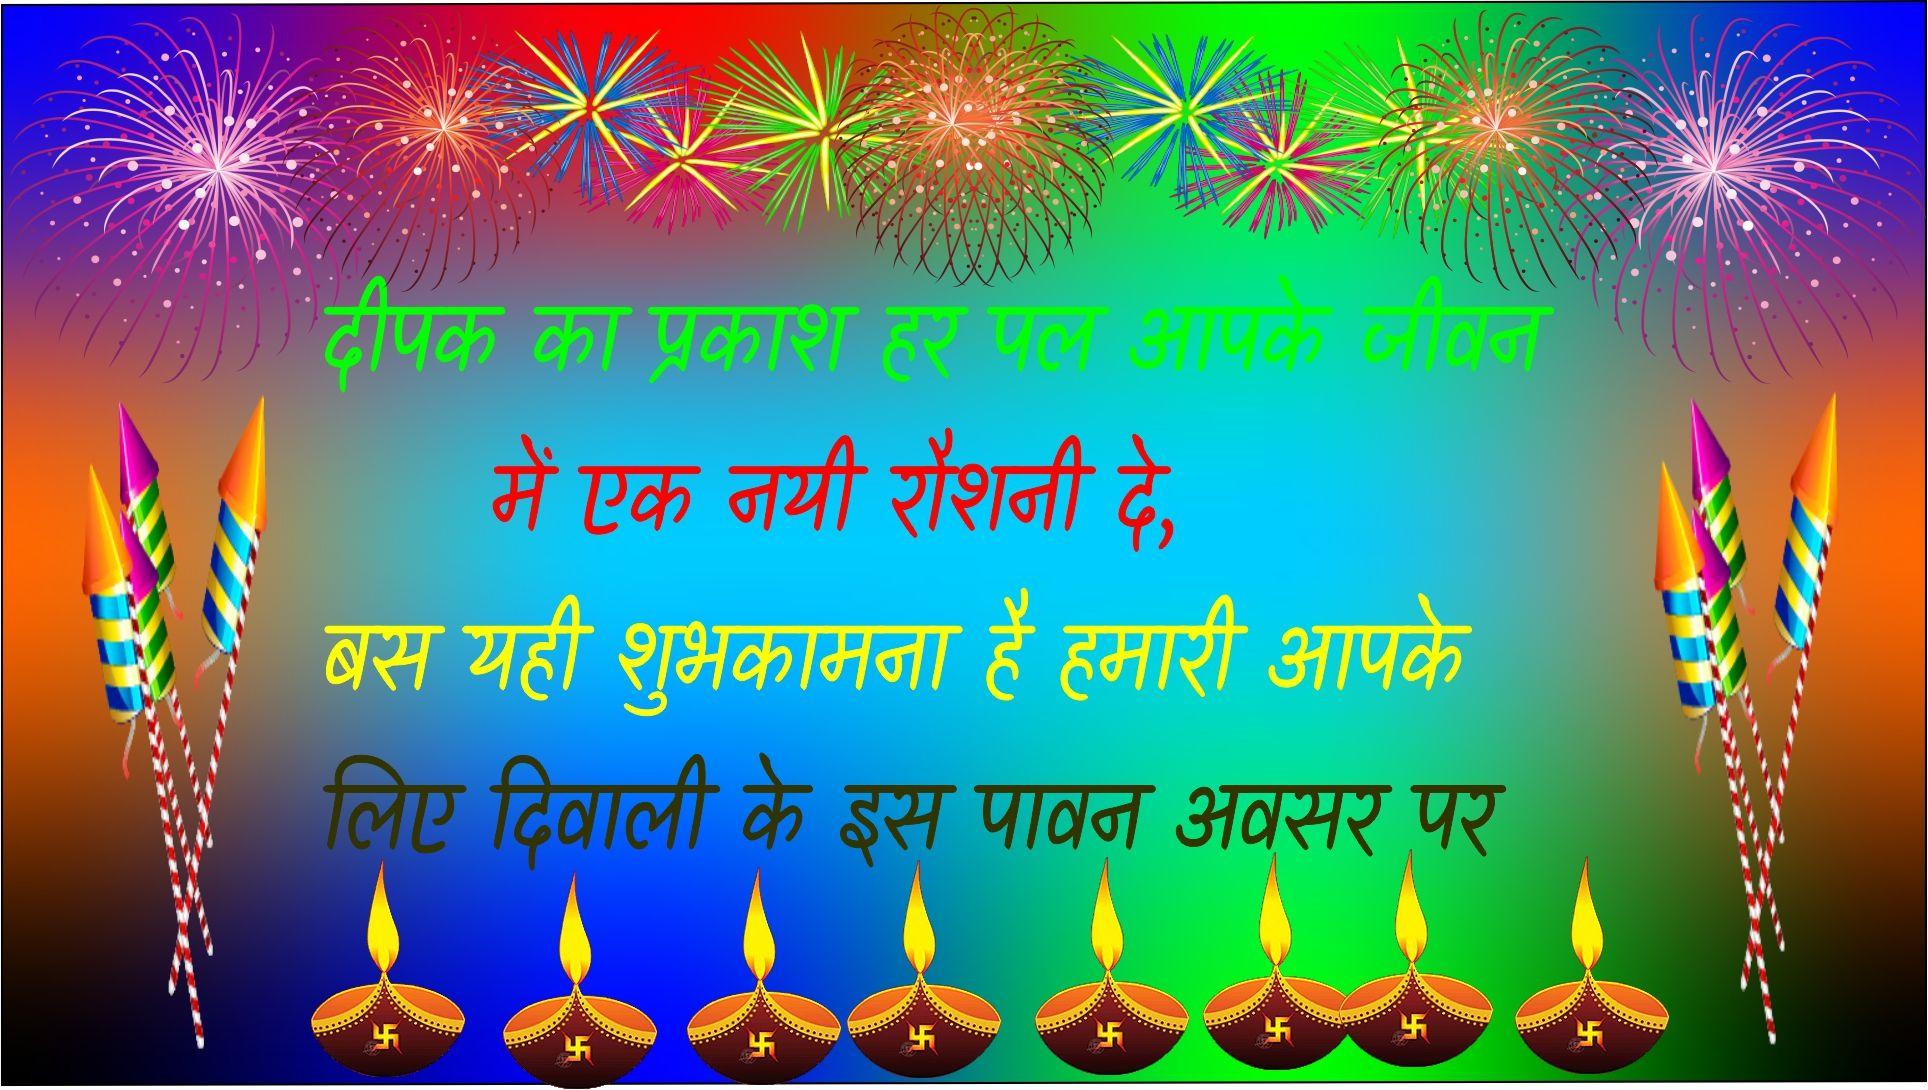 happy diwali sms in hindi short slogans on diwali in hindi